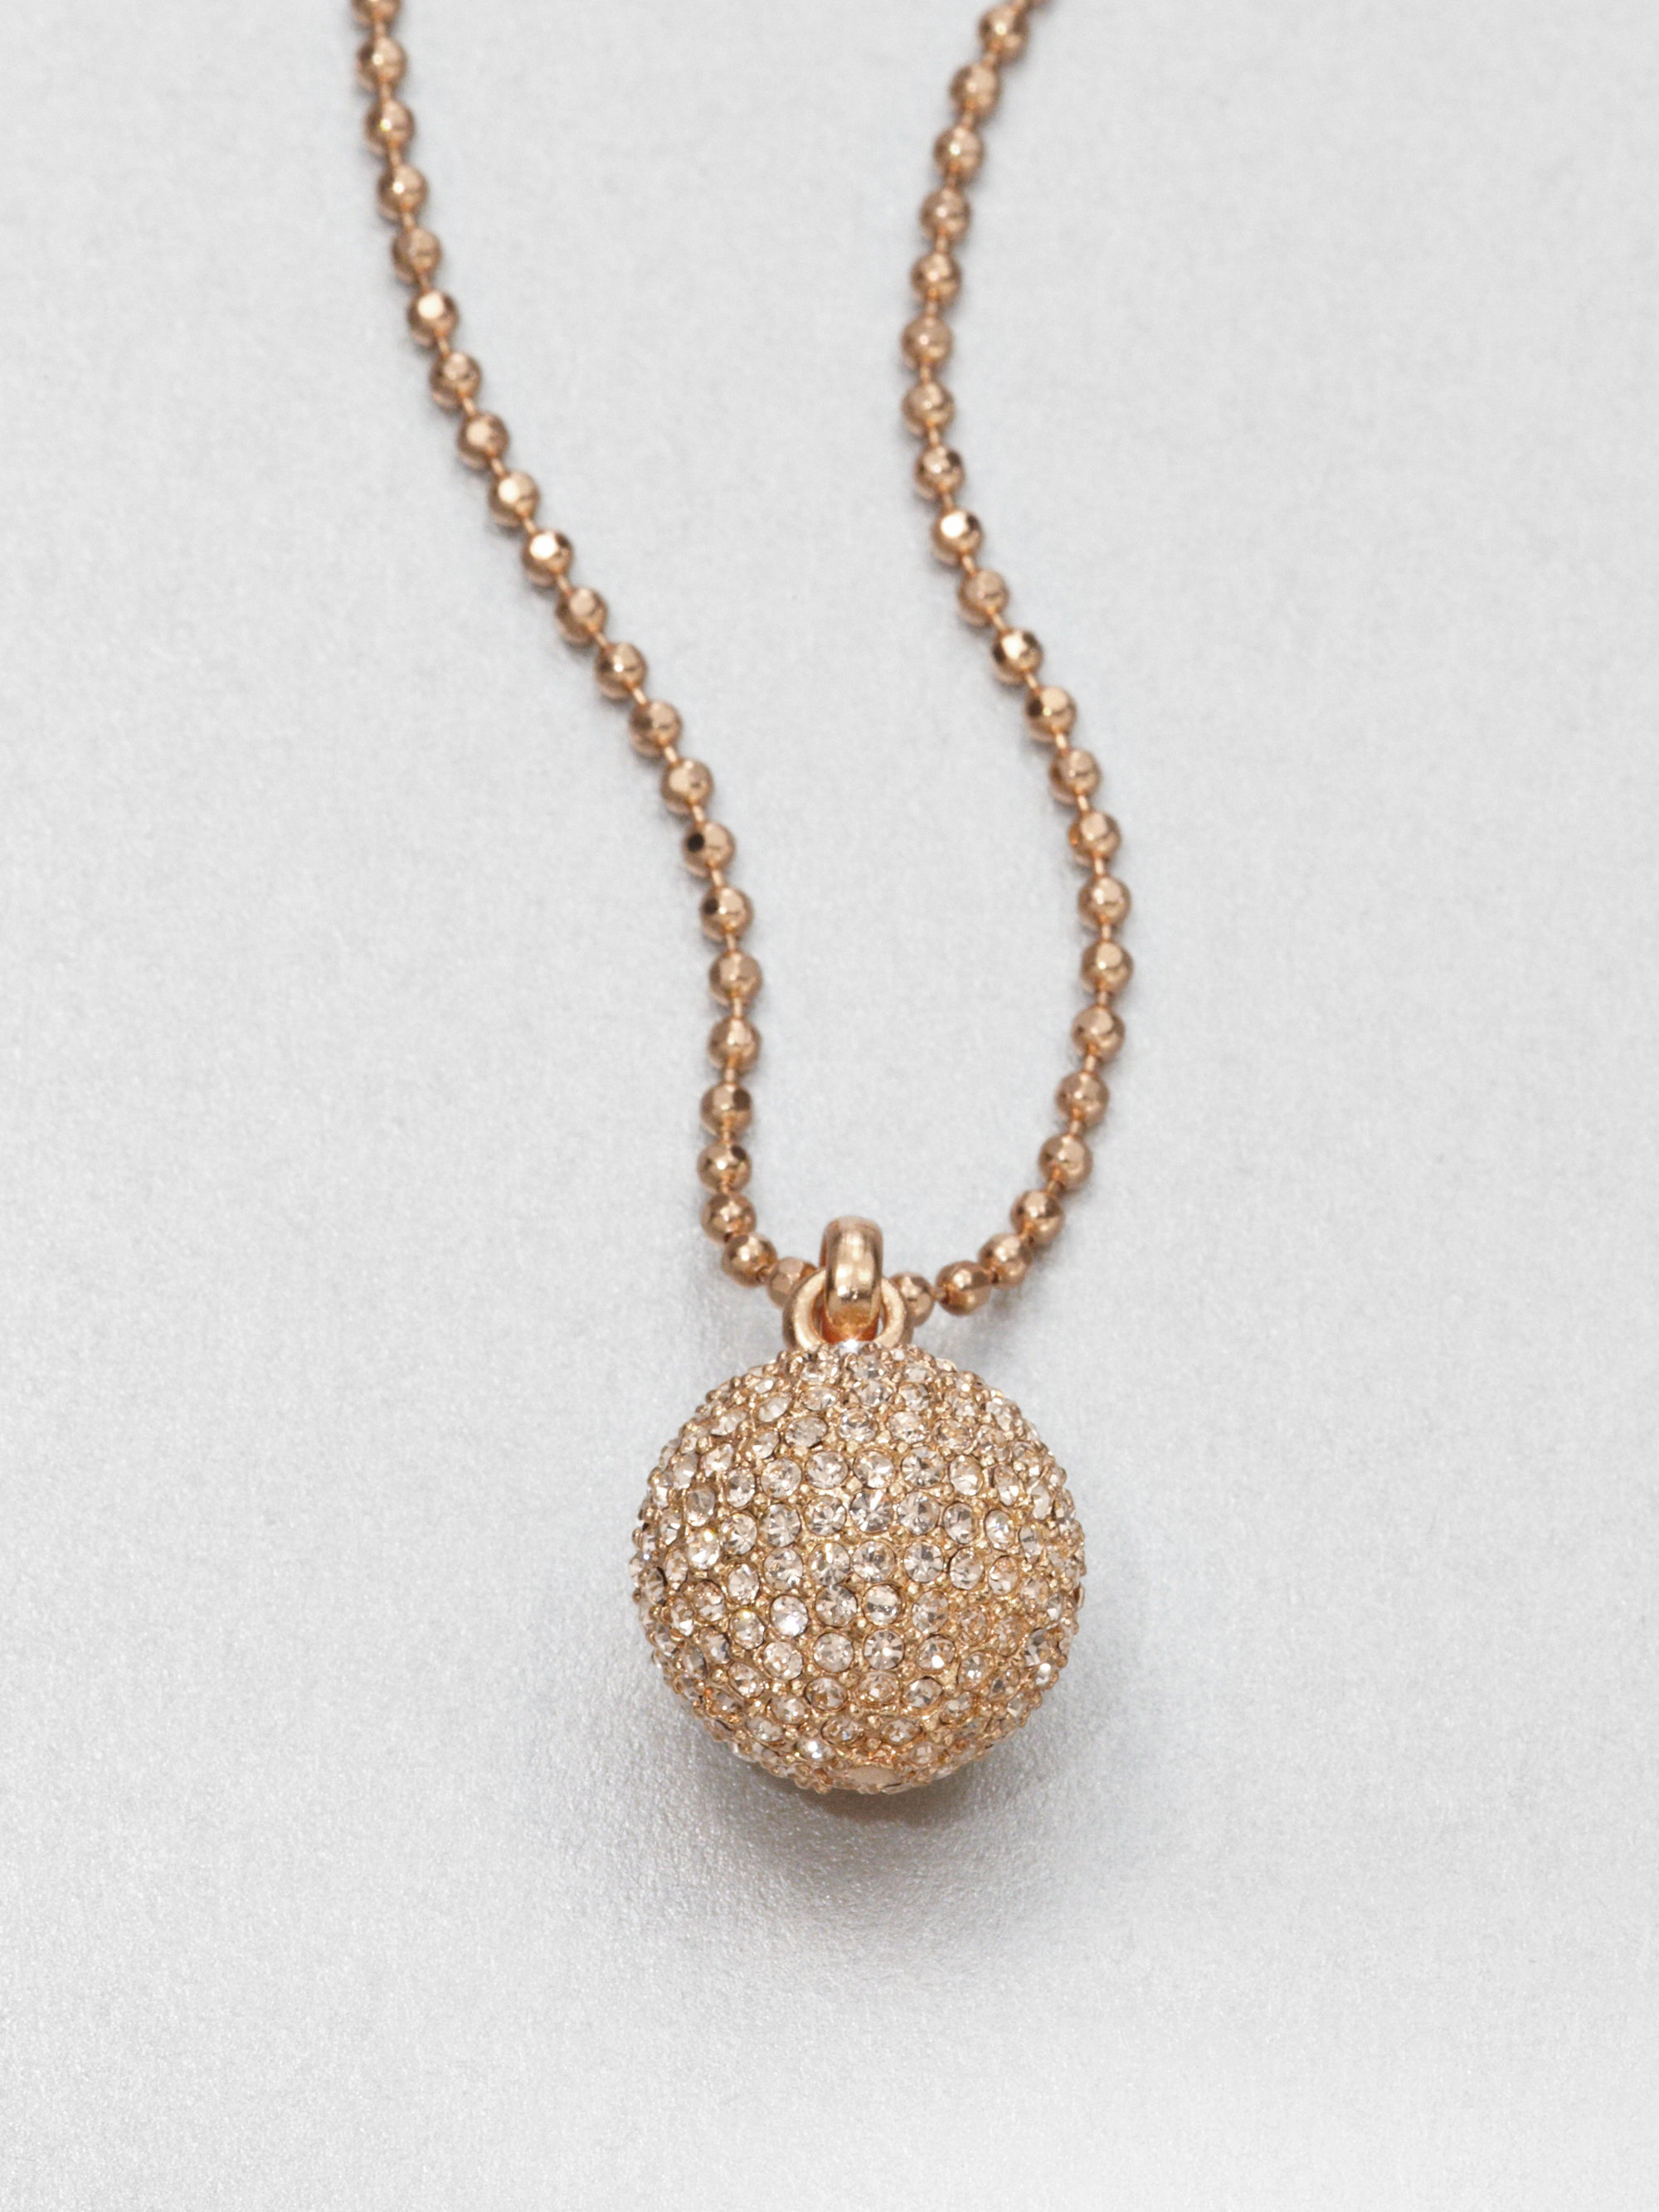 Lyst Michael Kors Pav 233 Ball Pendant Necklace Rose Gold